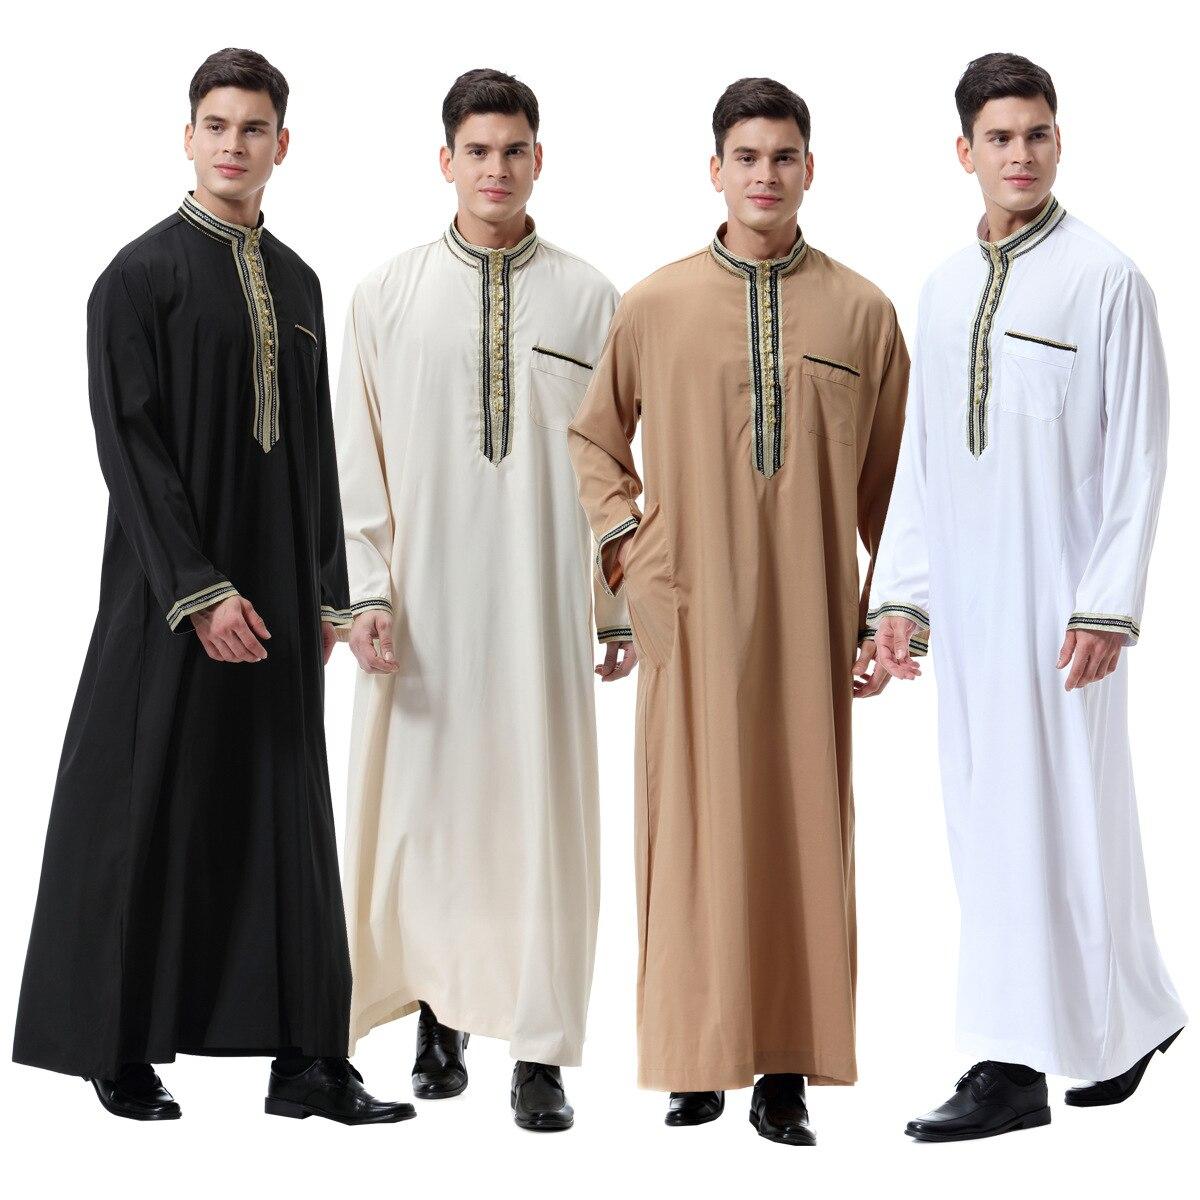 Moroccan kaftan Men Muslim Dres Abaya Set Formal Dress Pakistan Musulman  Homme Jubah Caftan Islam Clothing